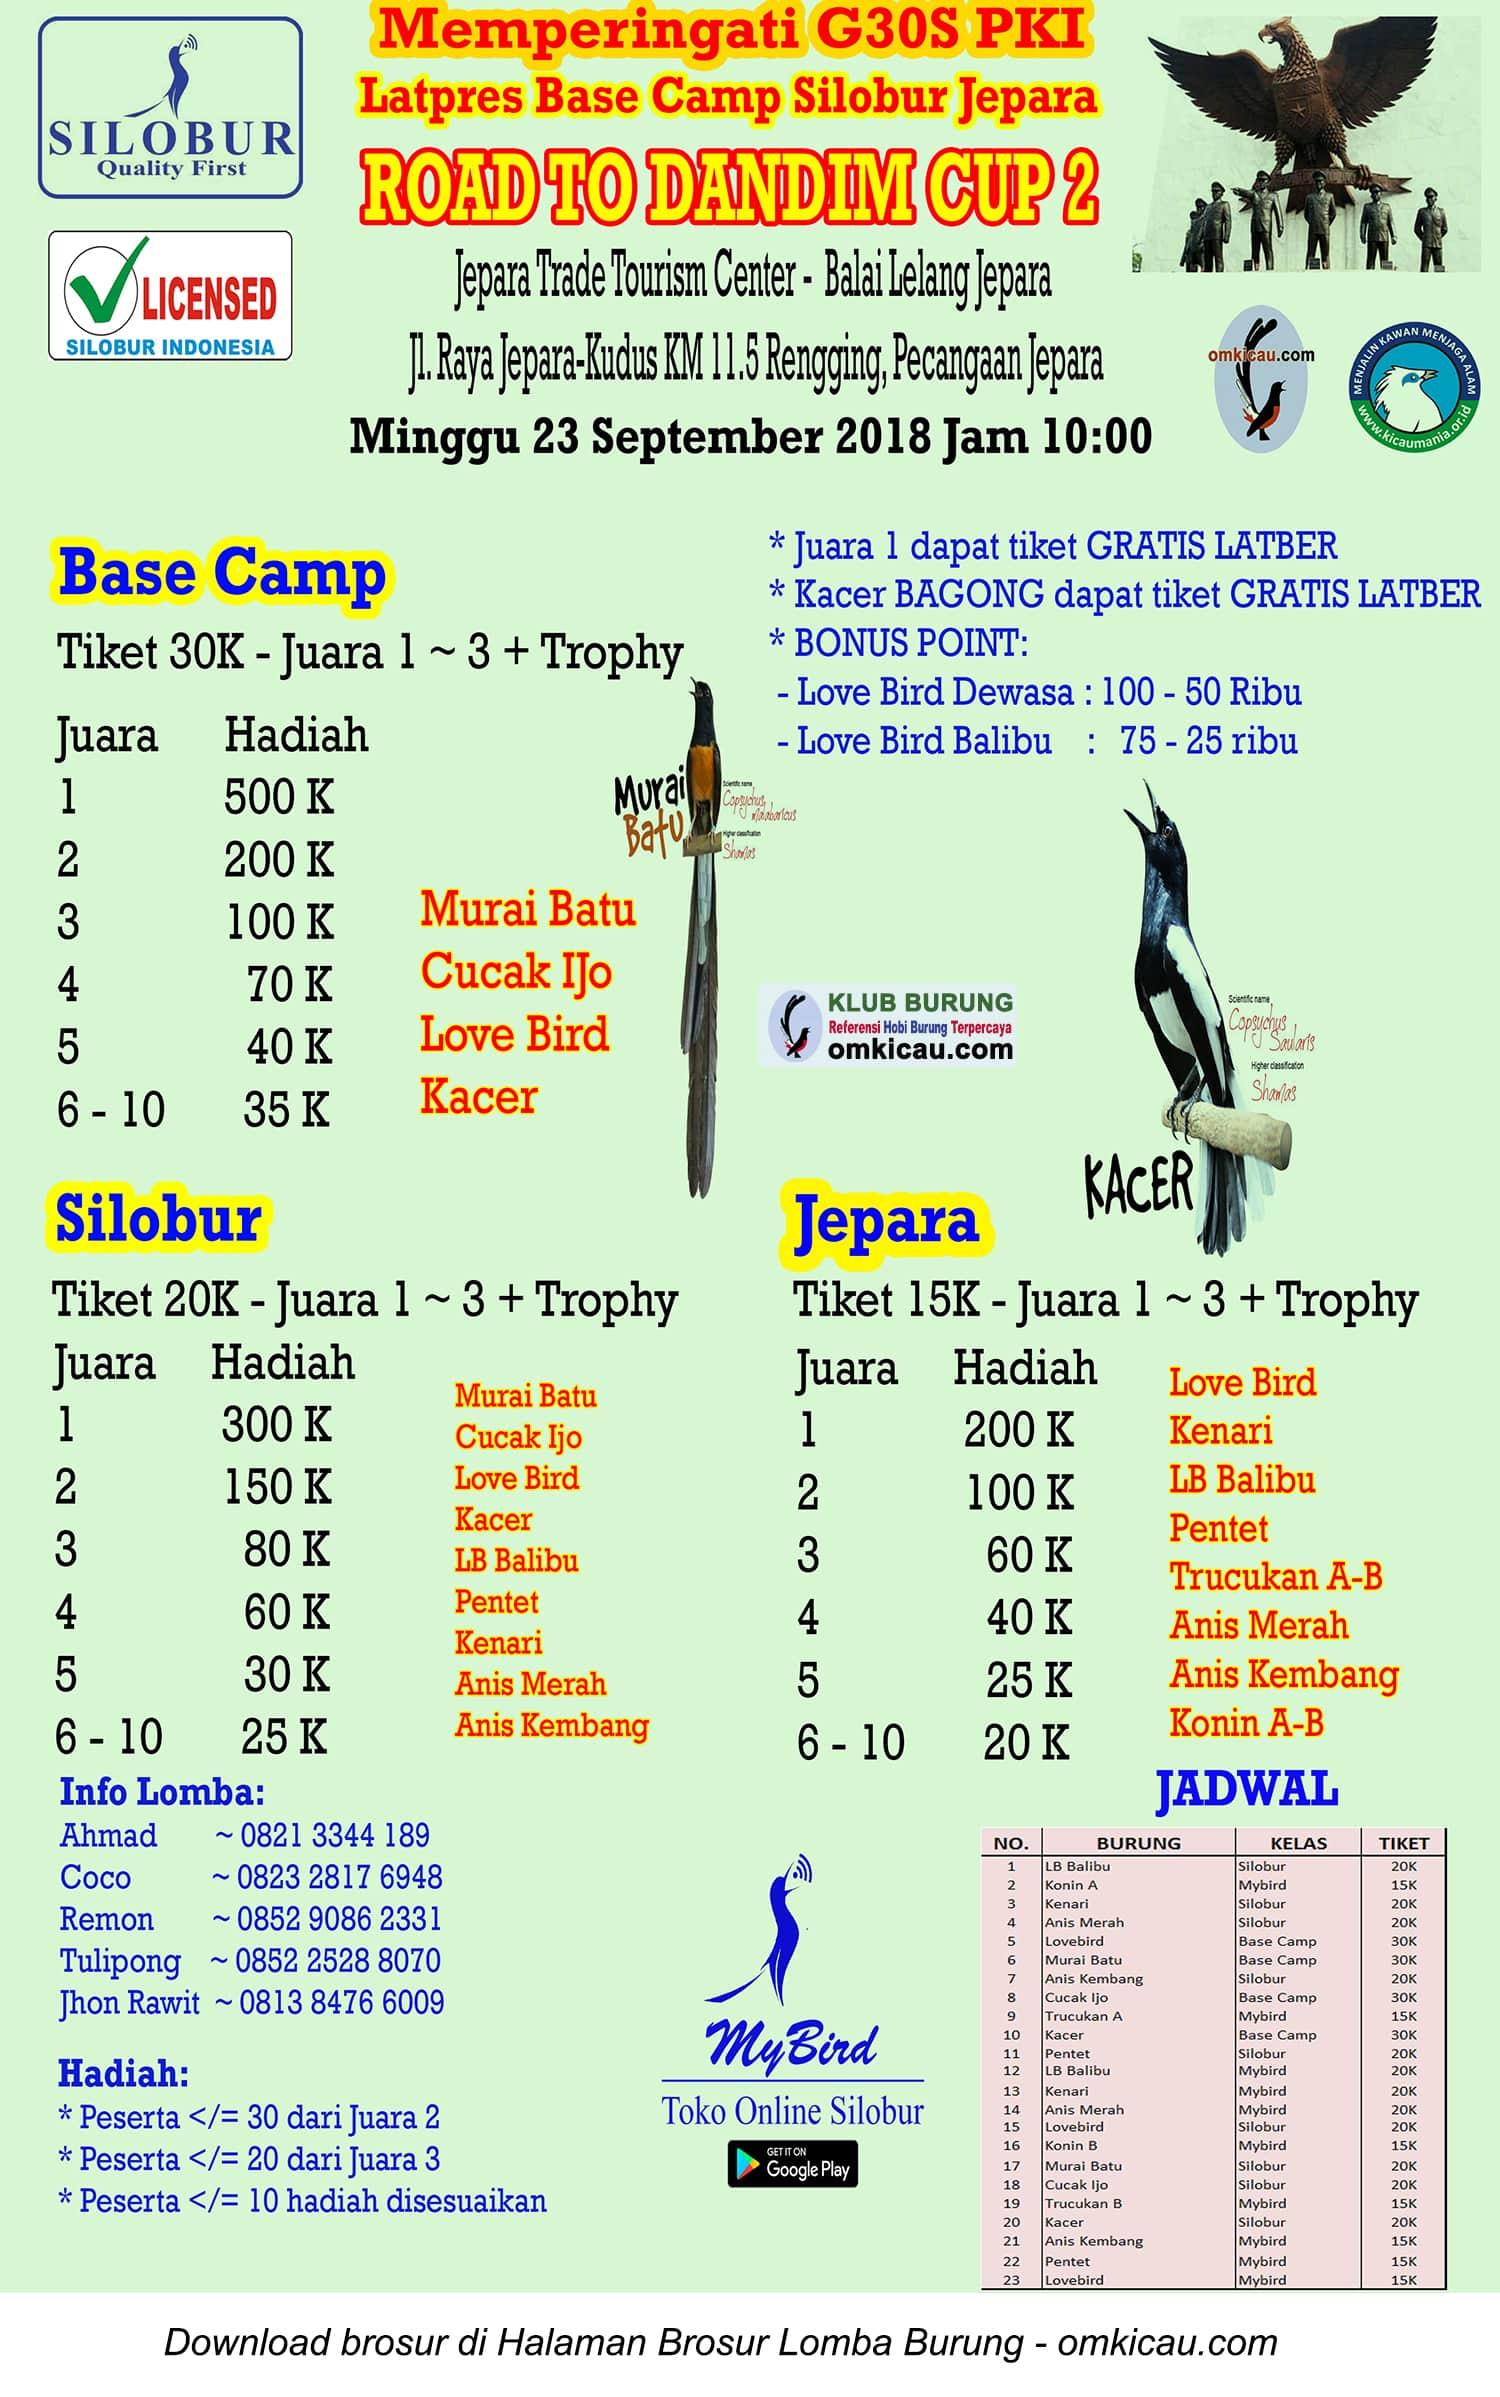 Road to Dandim Cup 2